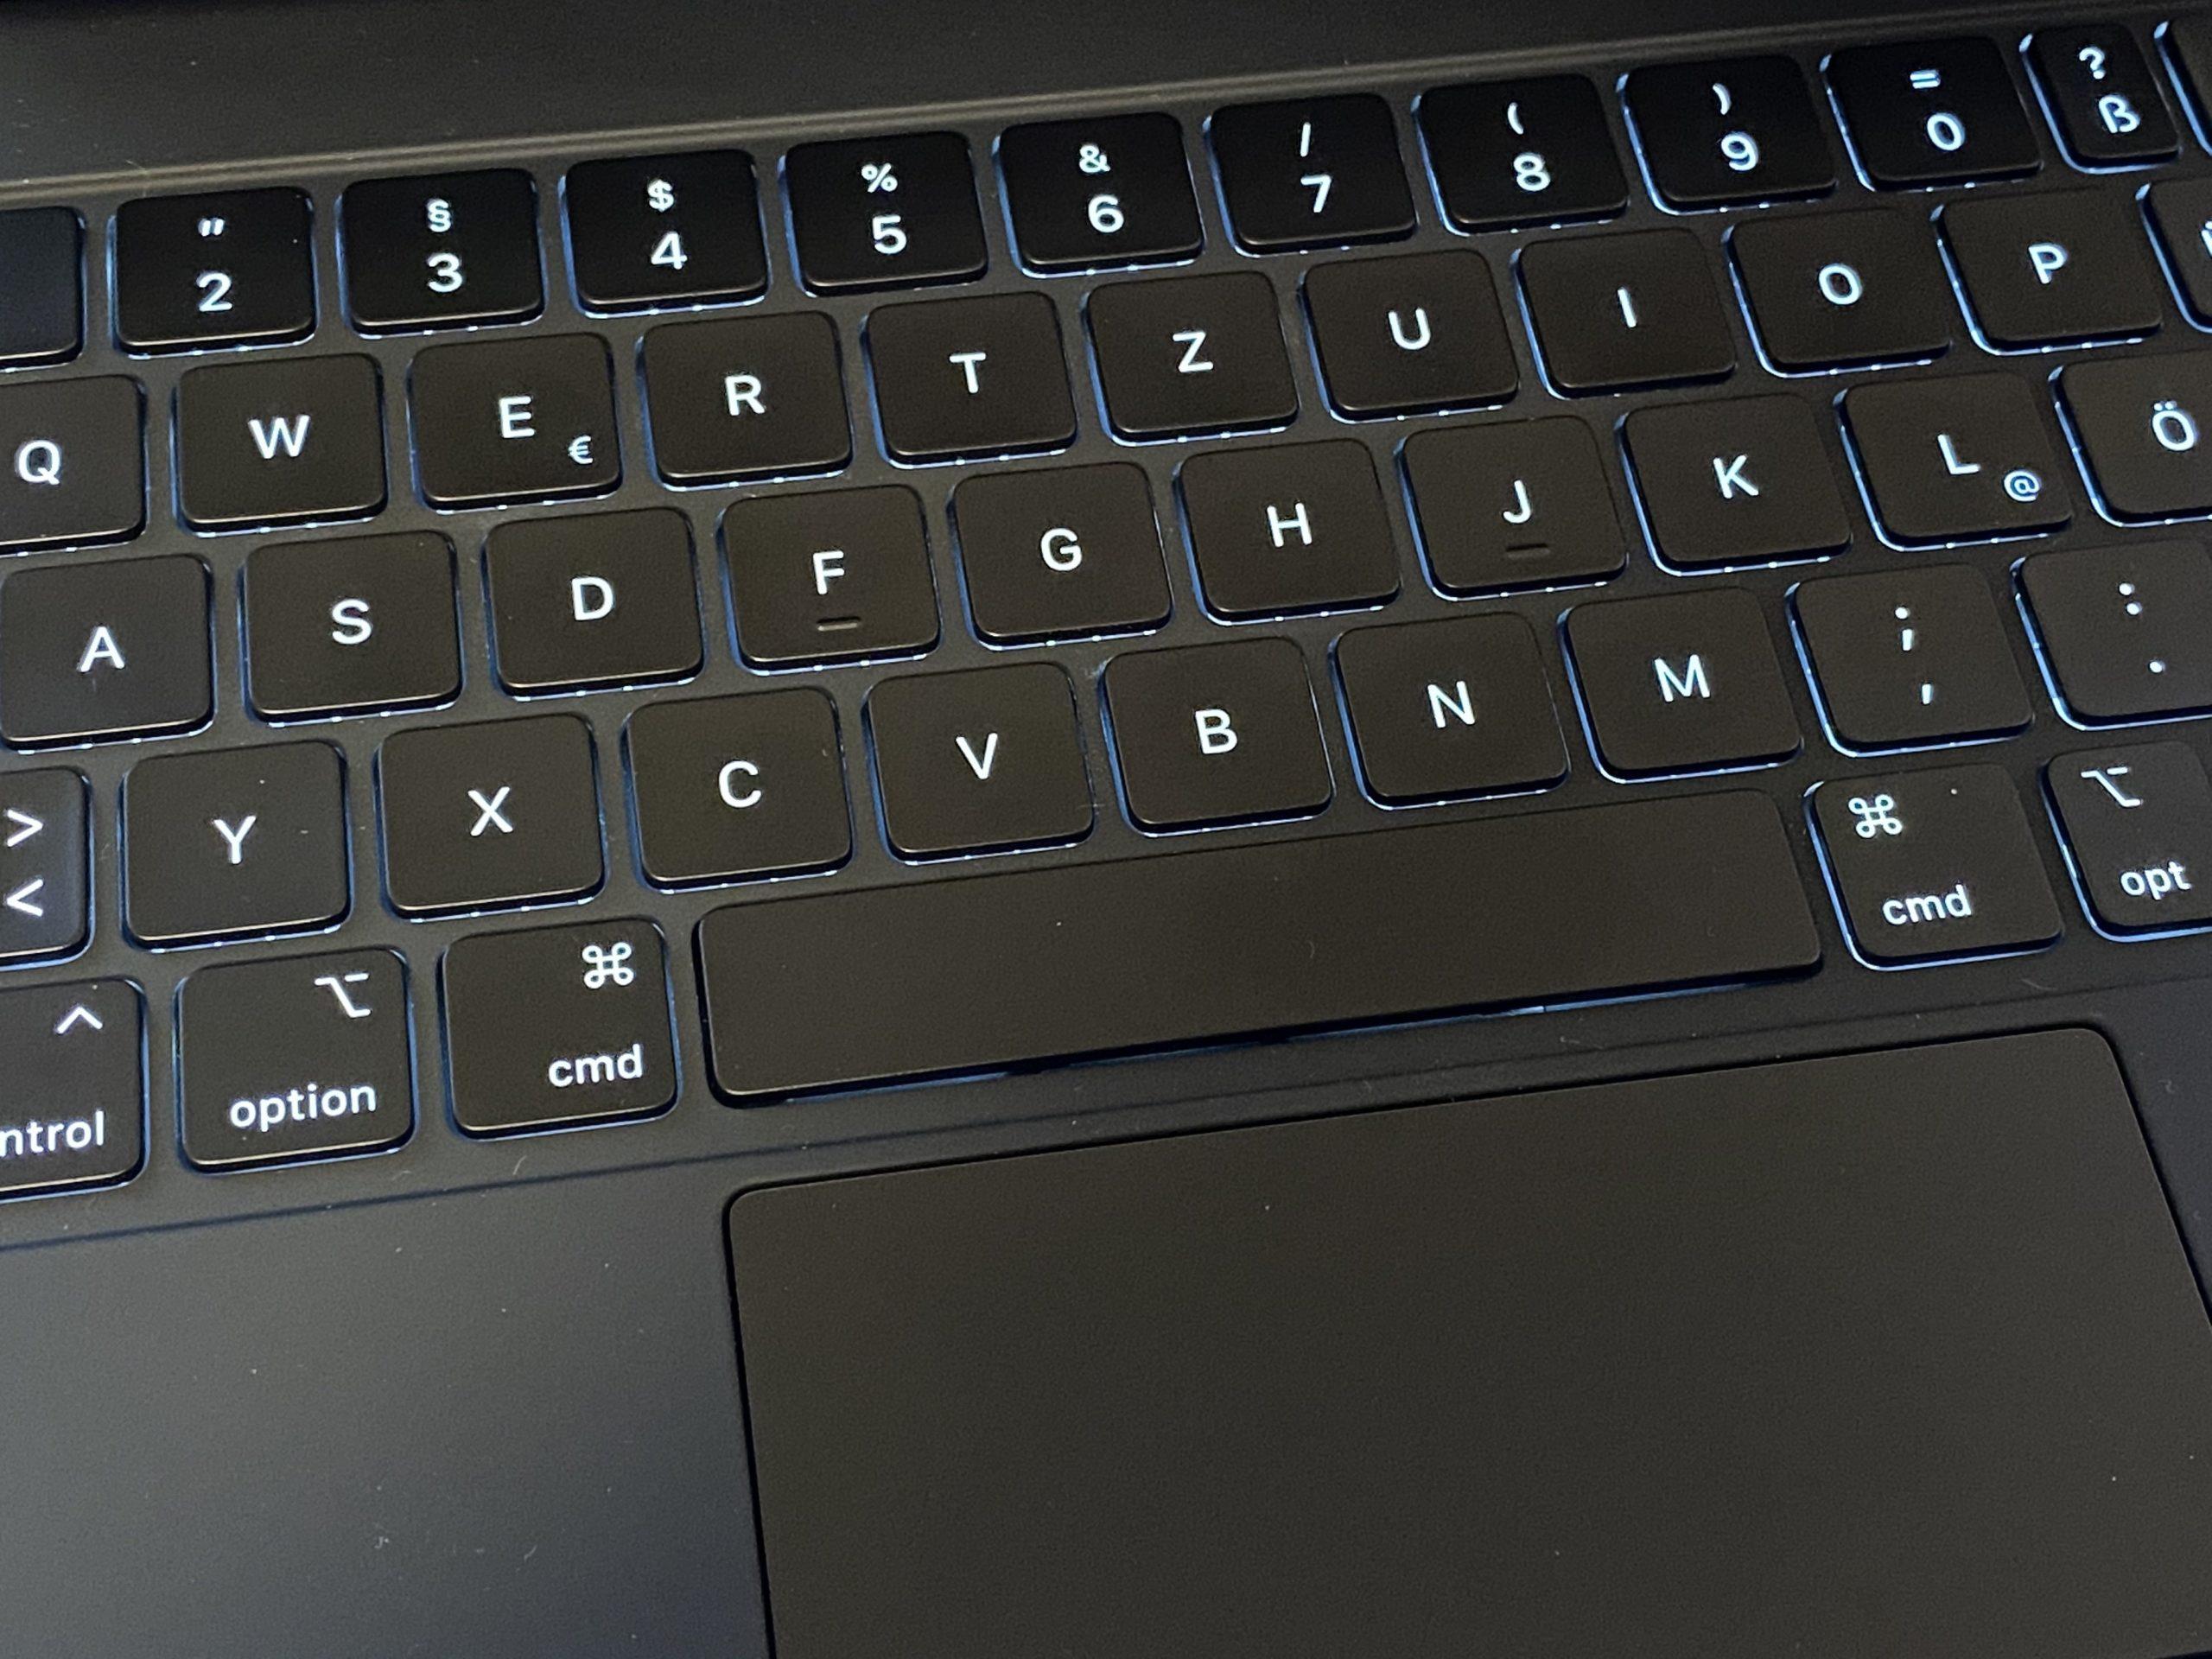 Magic Keyboard fürs iPad Pro mit Hintergrundbeleuchtung